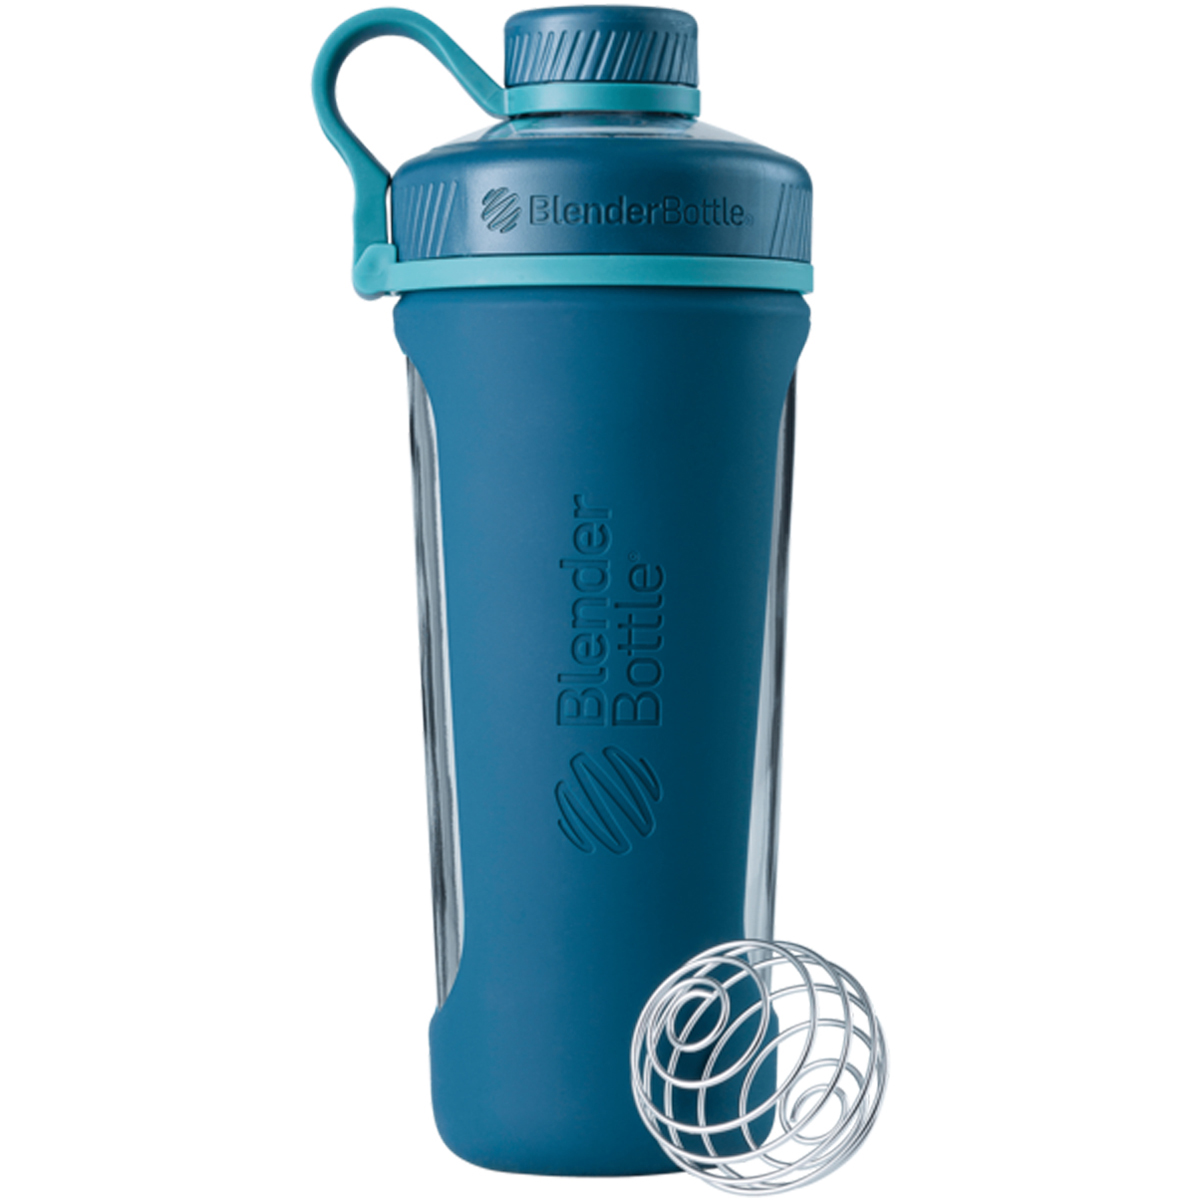 Blender Bottle Radian 28 oz. Glass Shaker Bottle with Loop Top | eBay